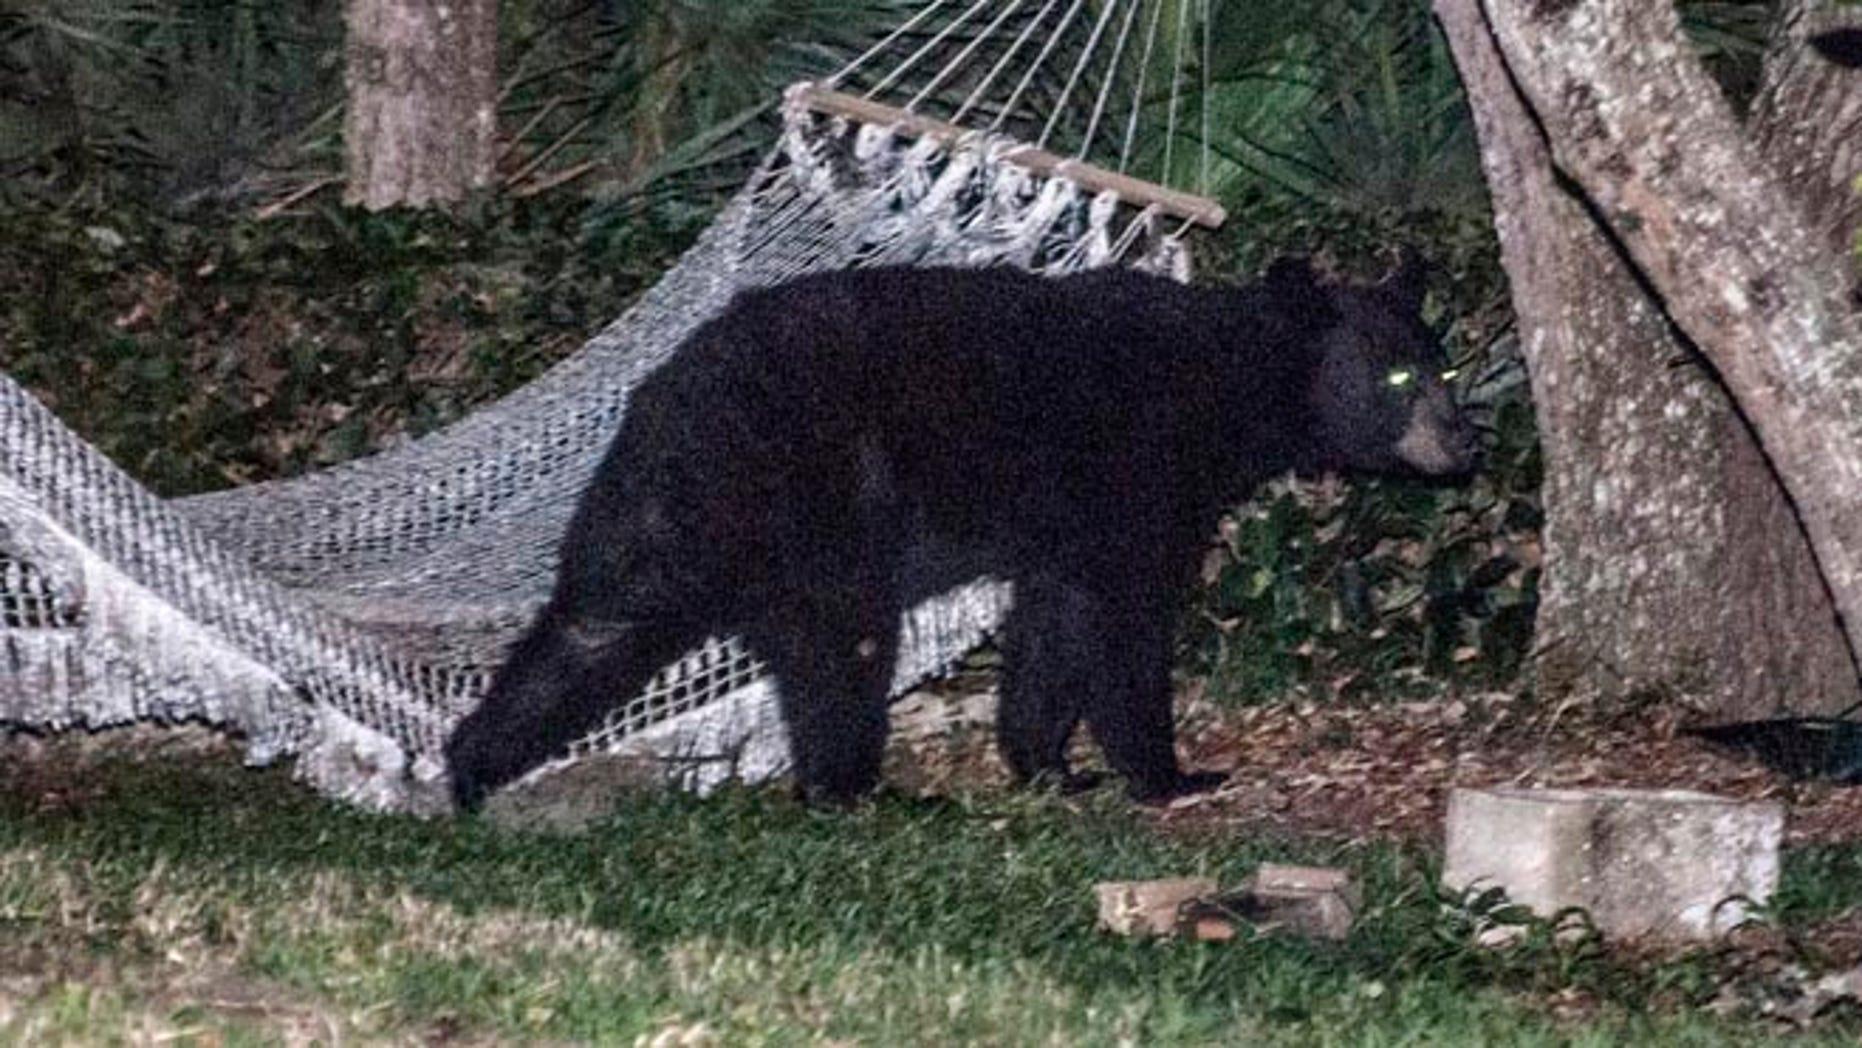 May 30, 2014: A black bear leaves a residential back yard in Daytona Beach, Florida.